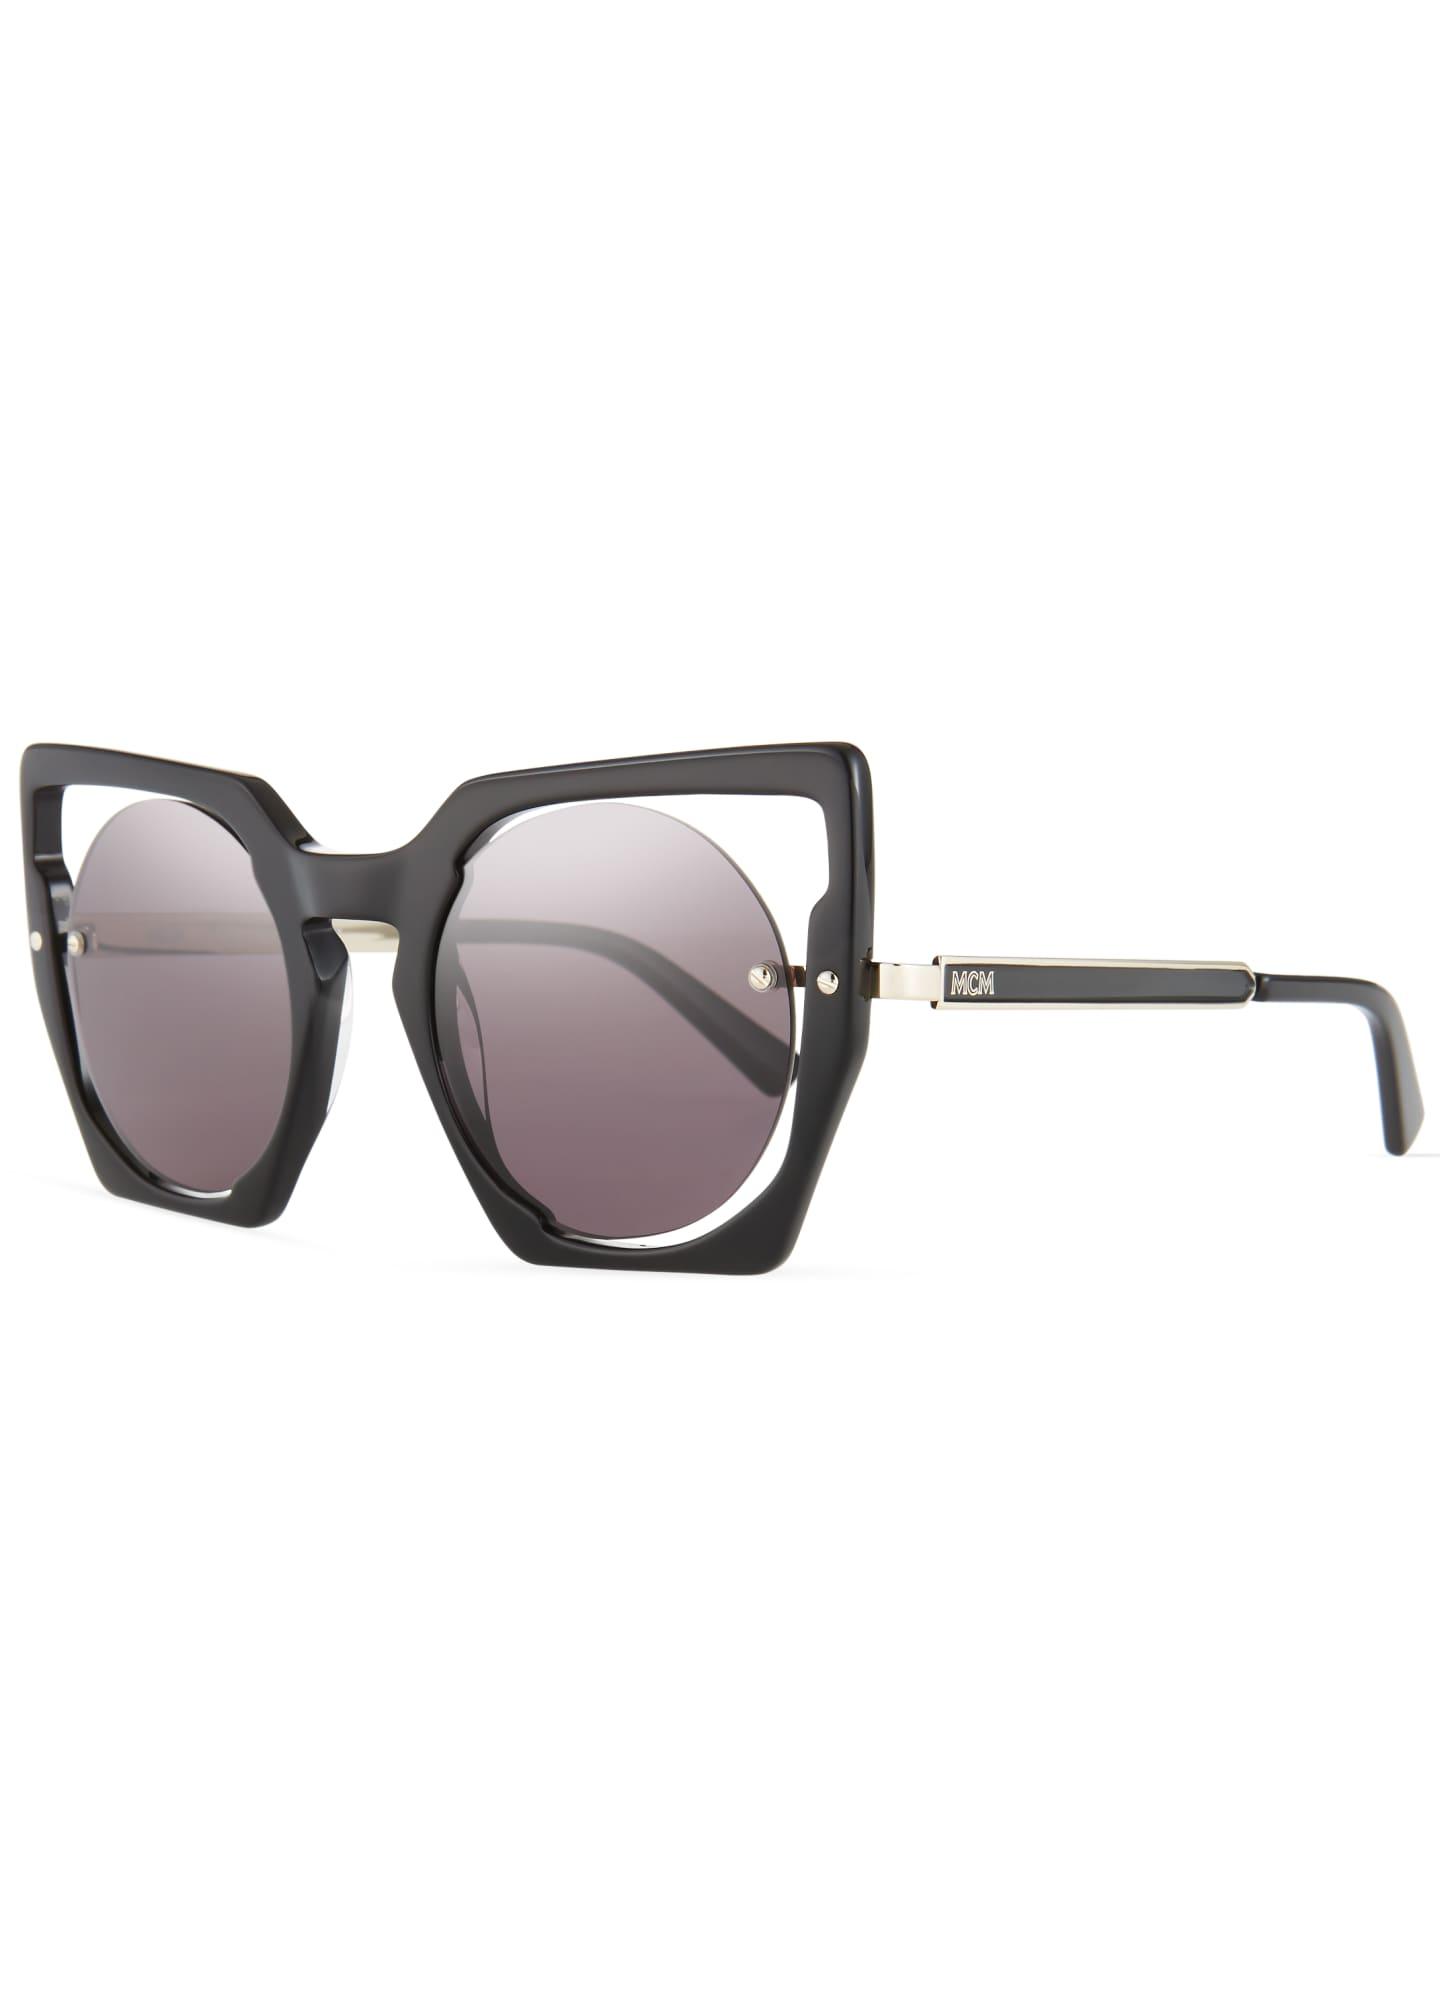 MCM Mirrored Cat-Eye Cutout Sunglasses